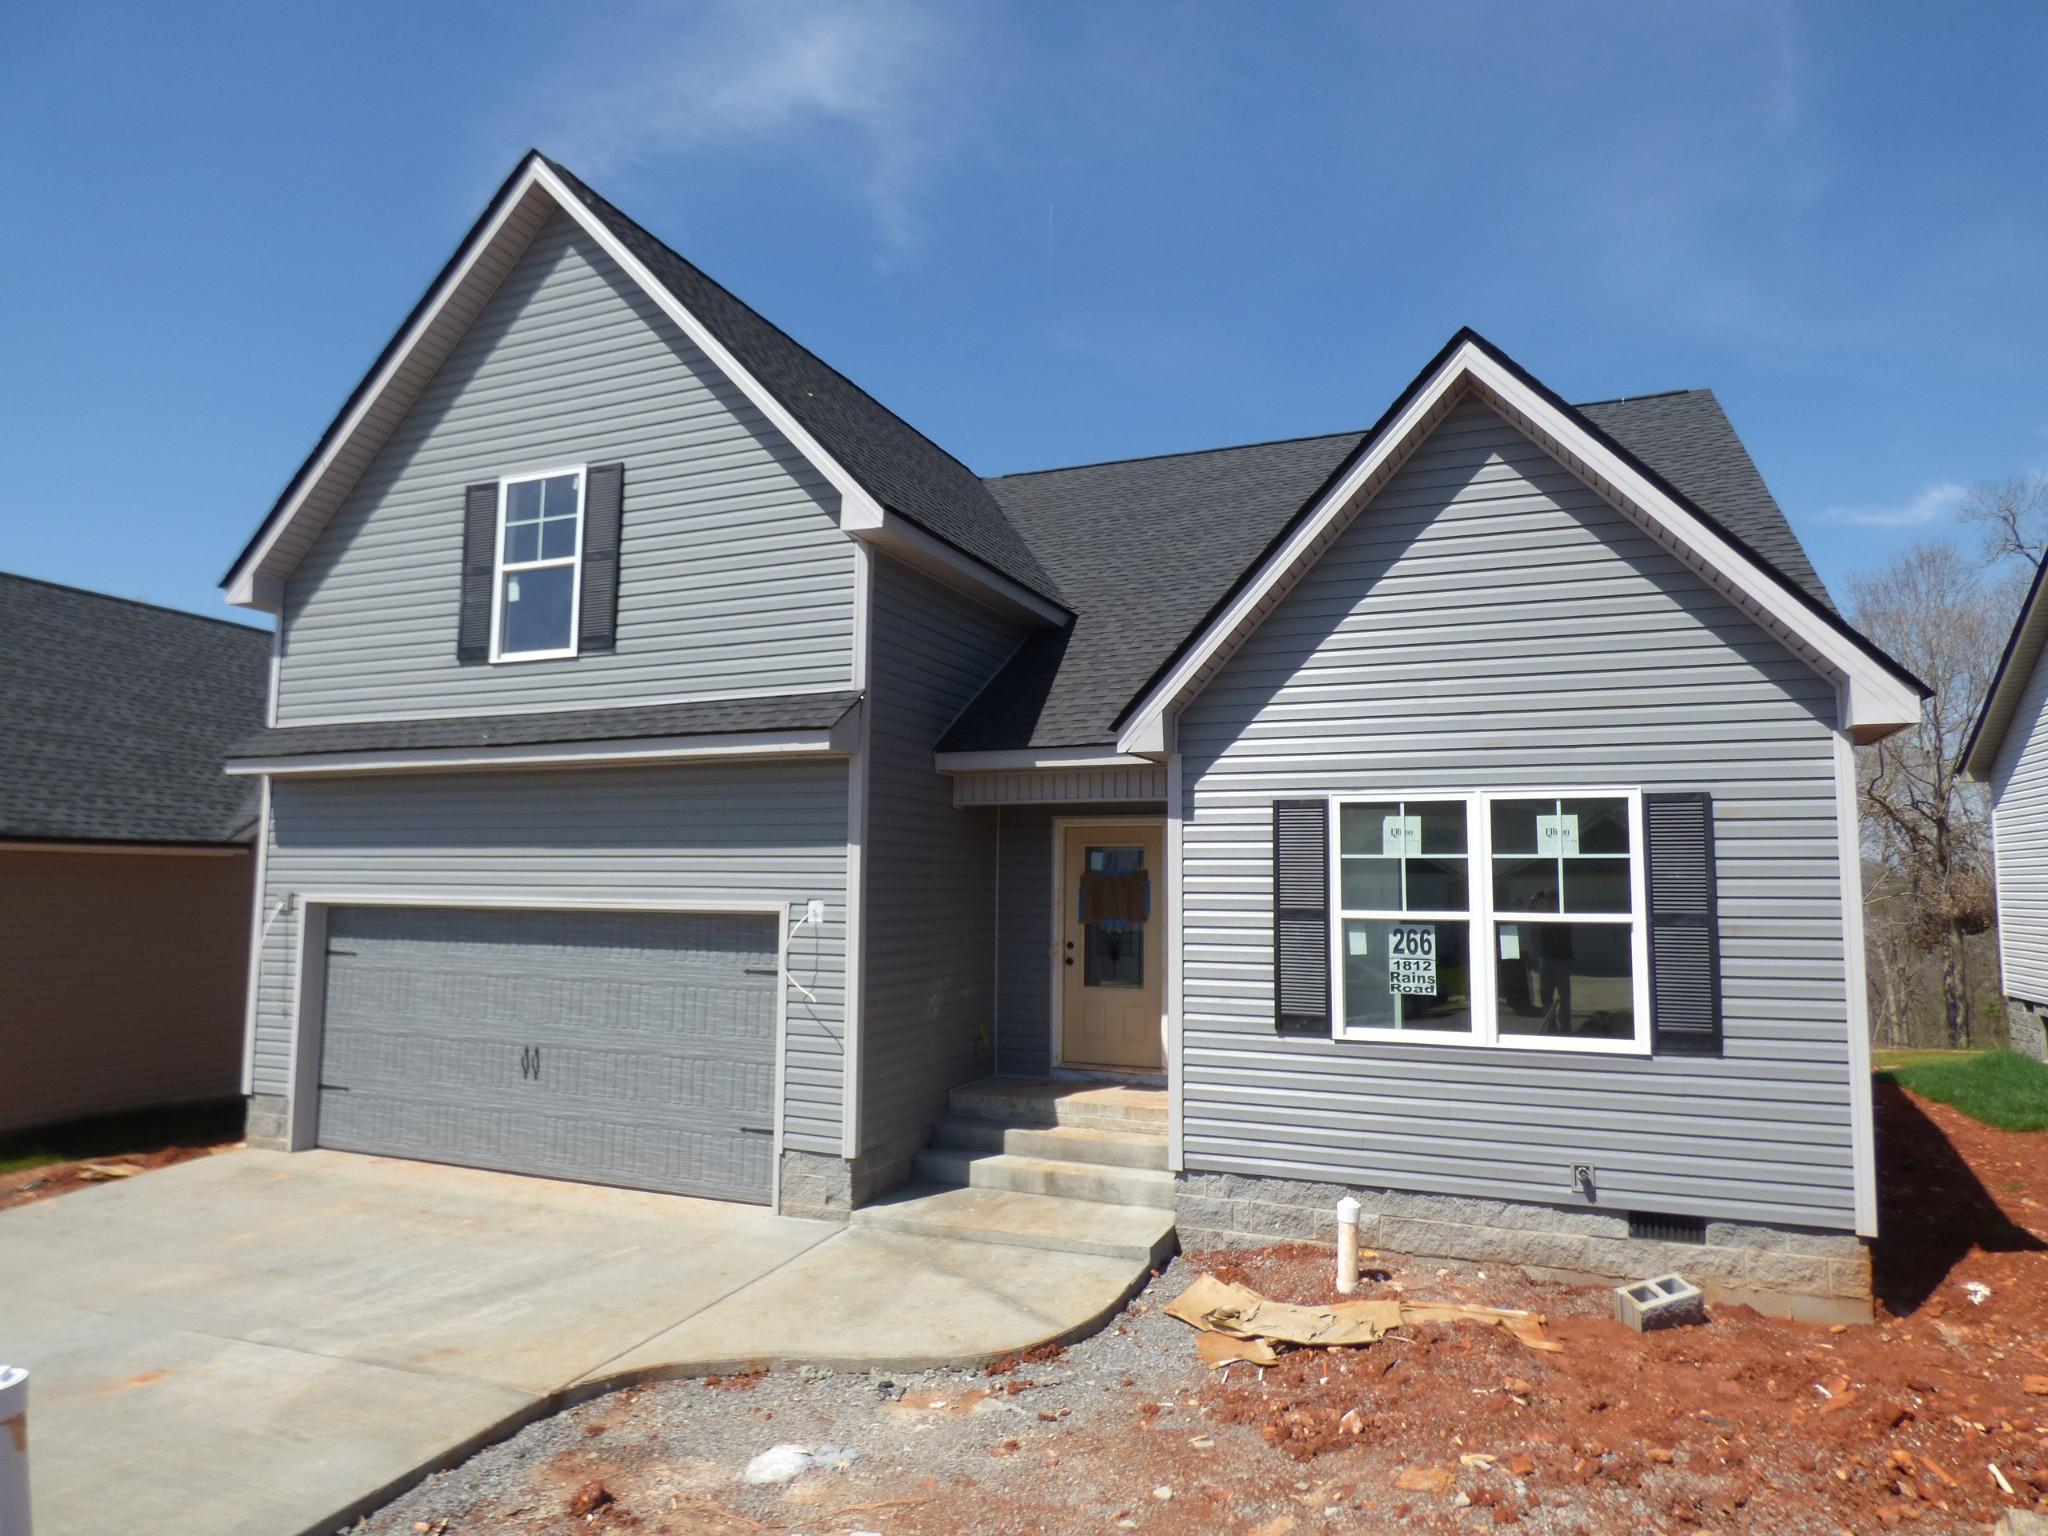 1812 Rains Rd, Clarksville, TN 37042 - Clarksville, TN real estate listing